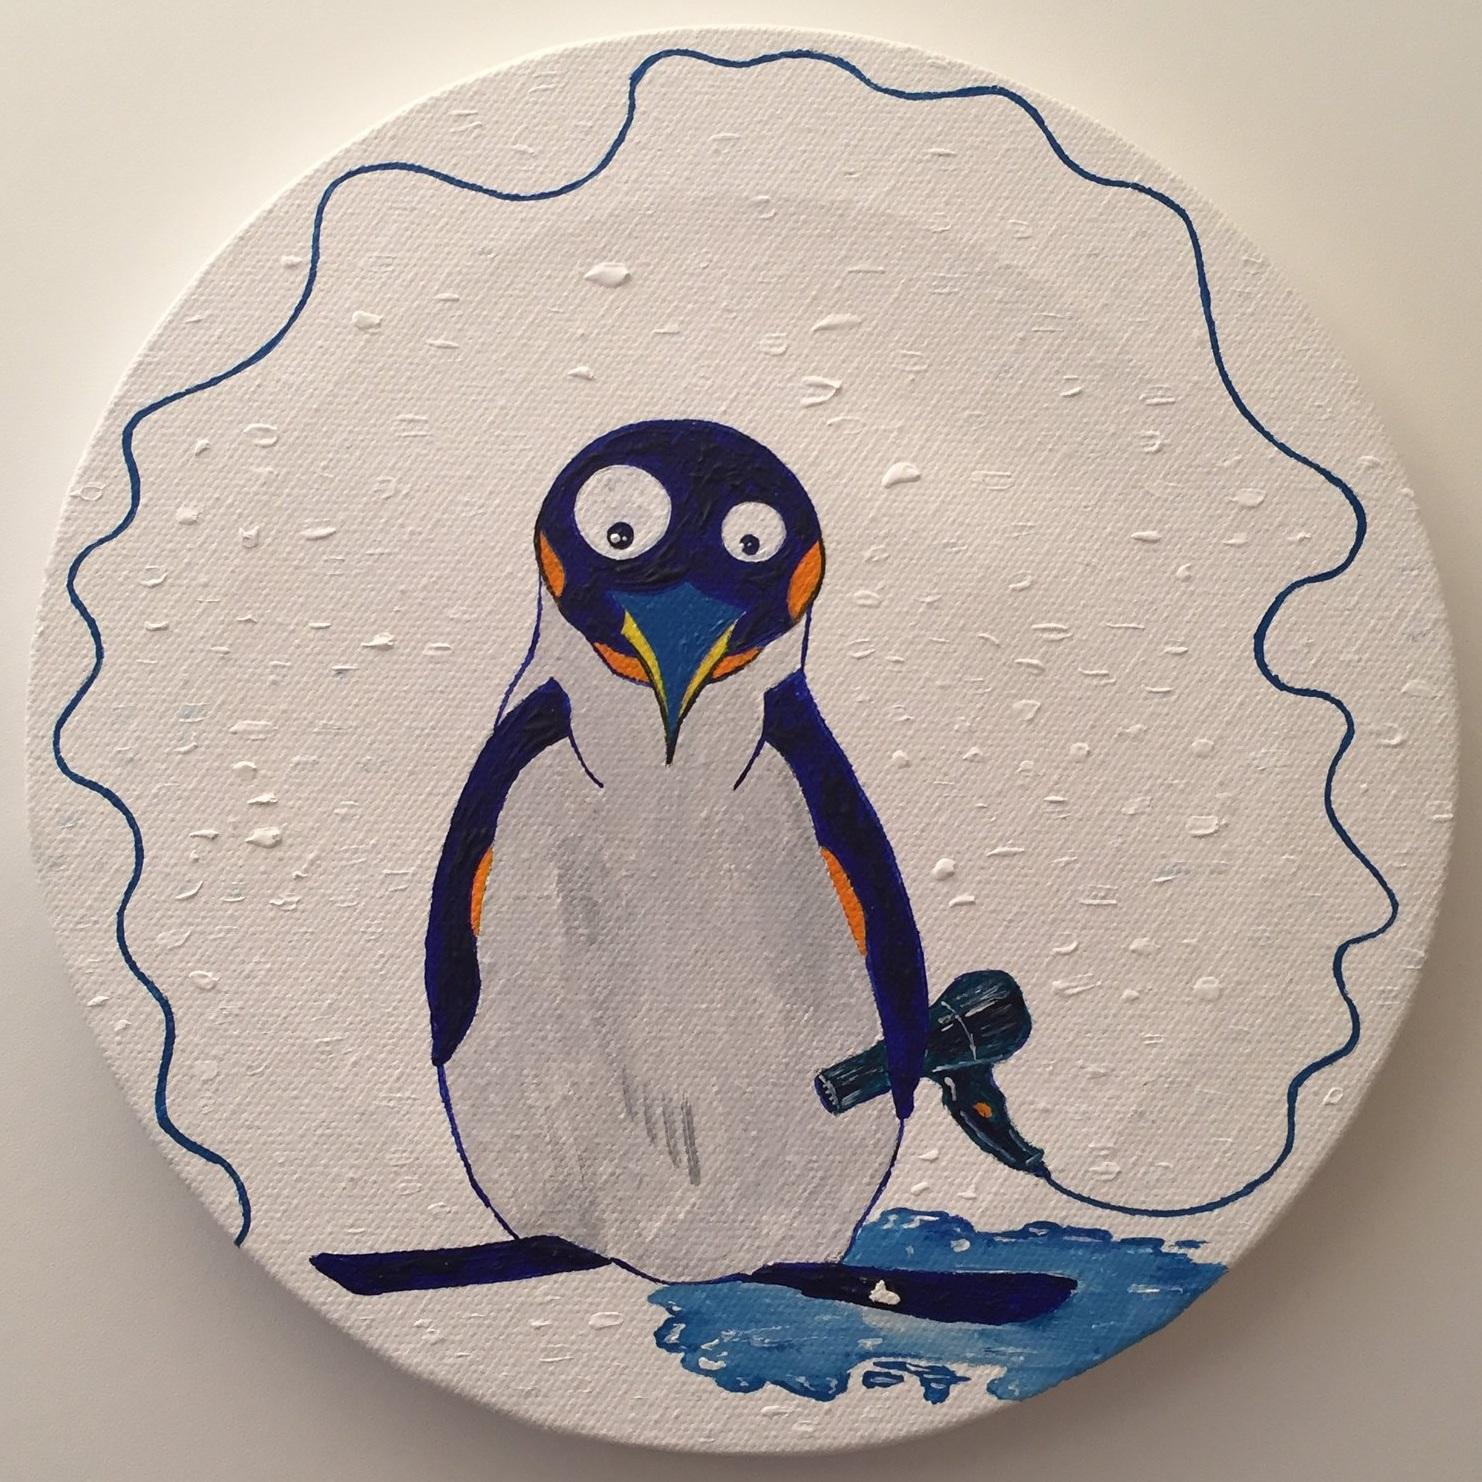 Suicidal penguin  2013 Acrylics on canvas 20cm diameter